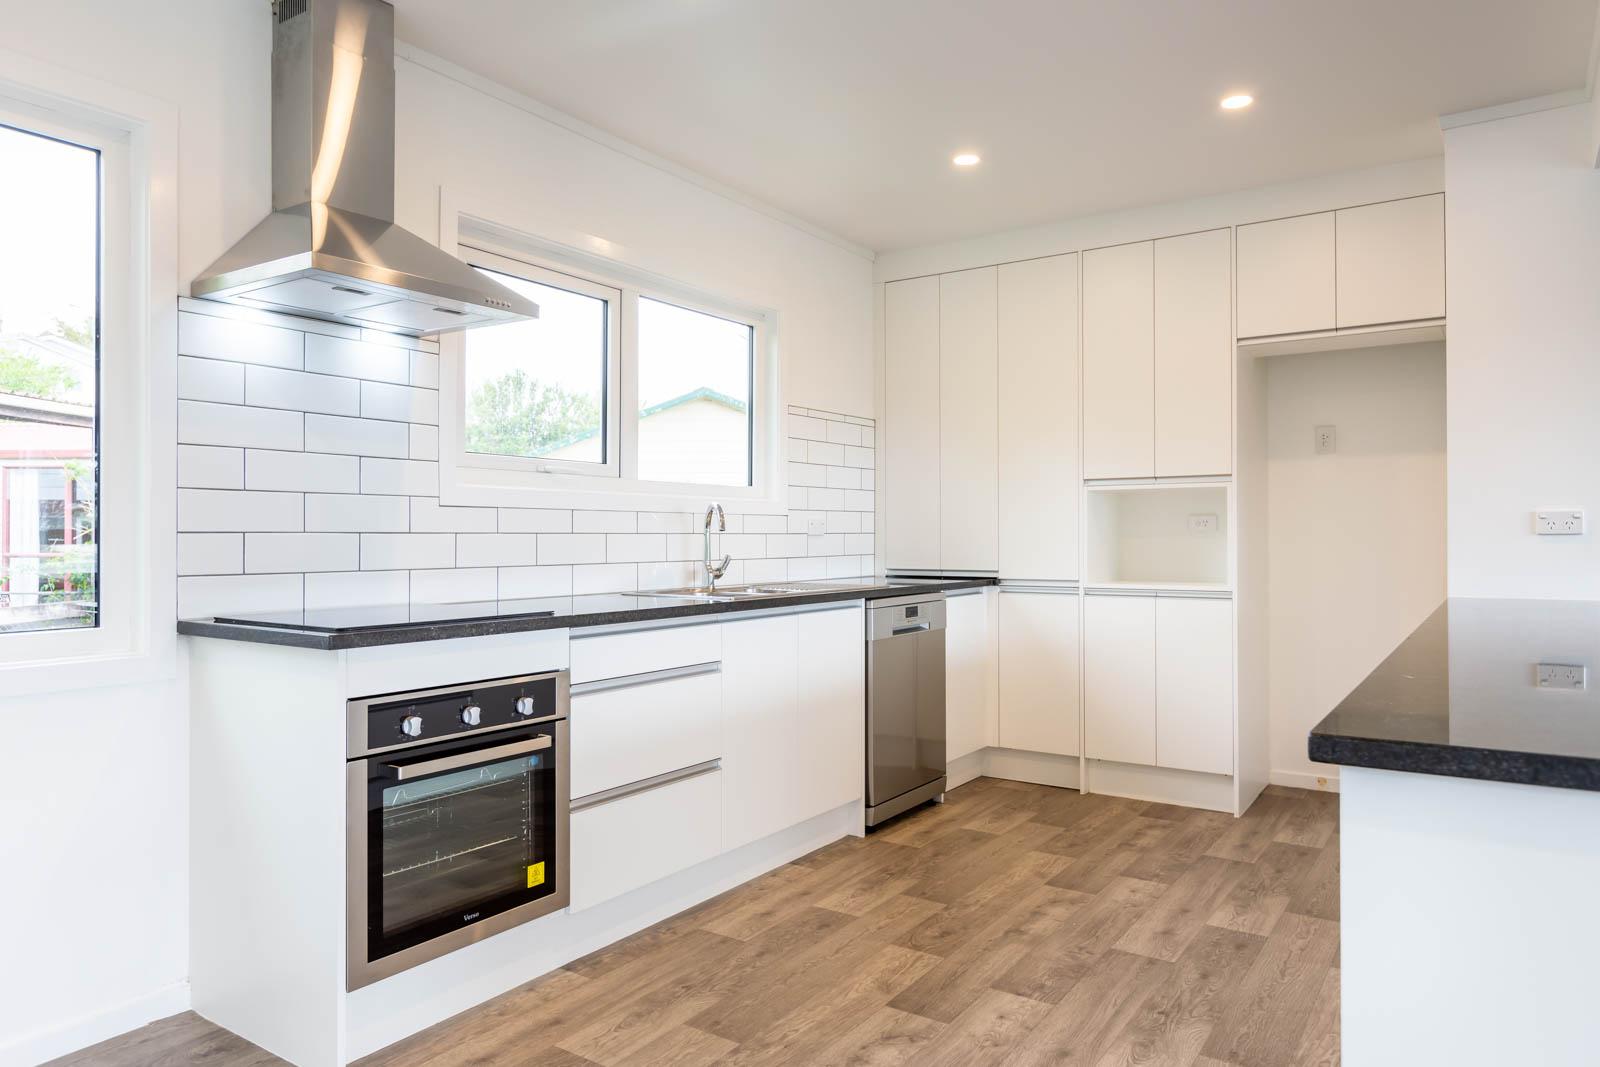 Full Interior Home Renovation at Glen Eden